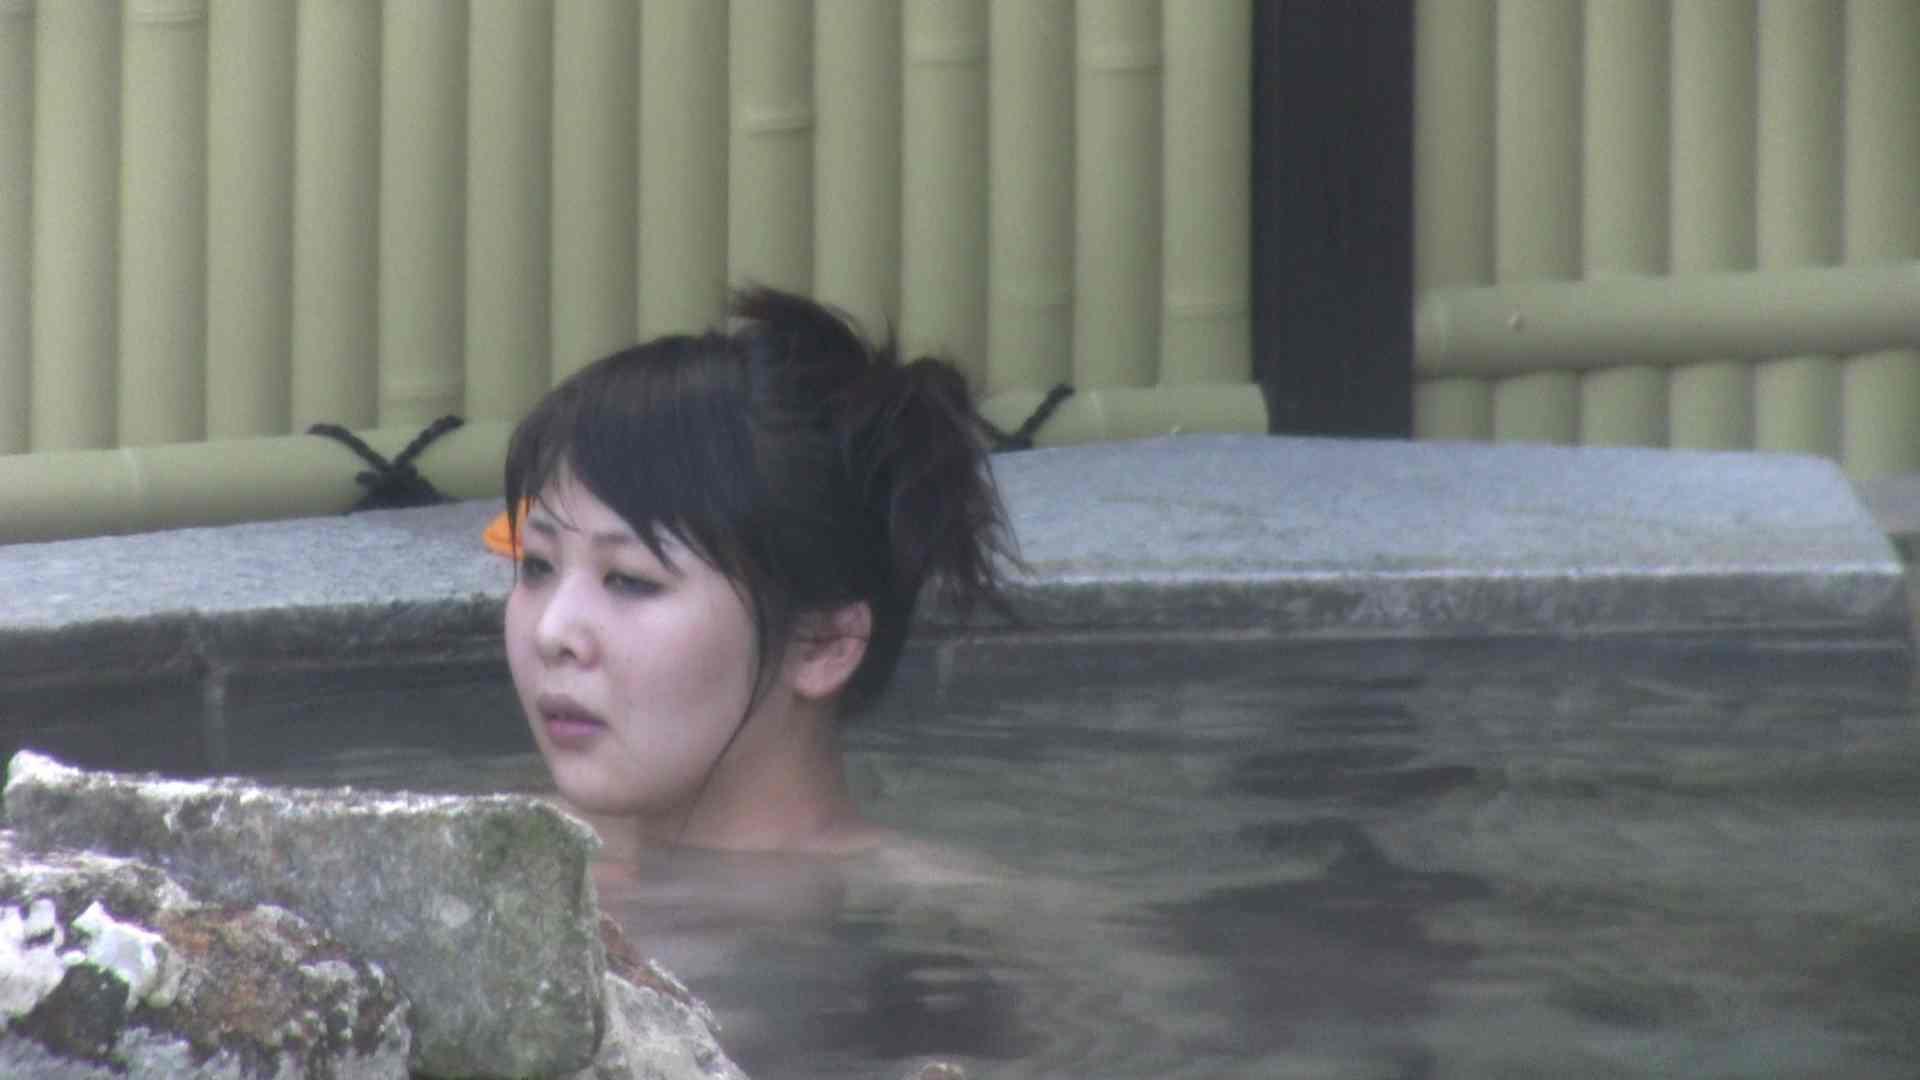 Aquaな露天風呂Vol.118 女体盗撮 隠し撮りAV無料 68連発 17